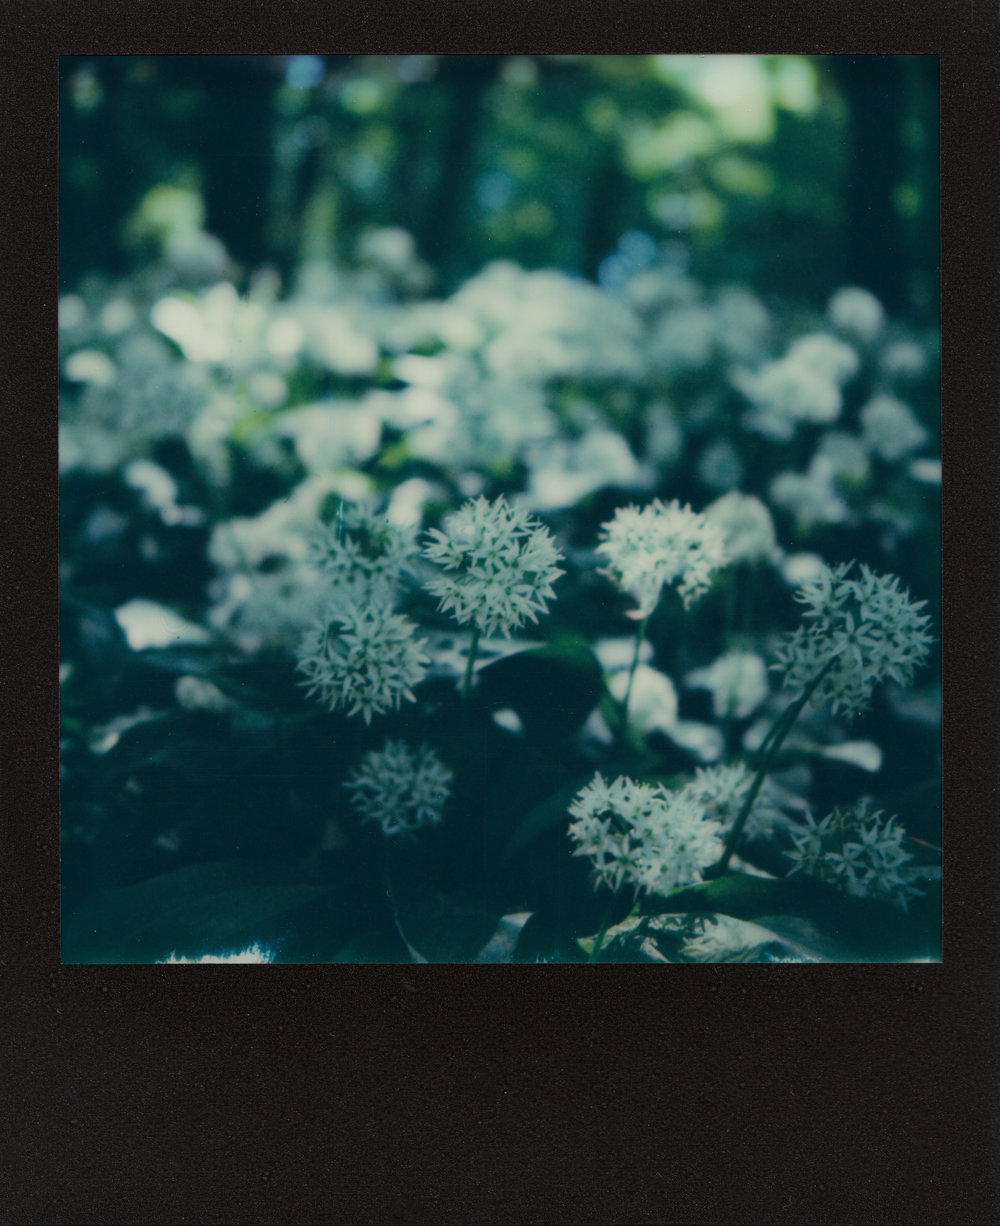 Bärlauch | Polaroid SX-70 | Impossible Project Film | Ioana Taut